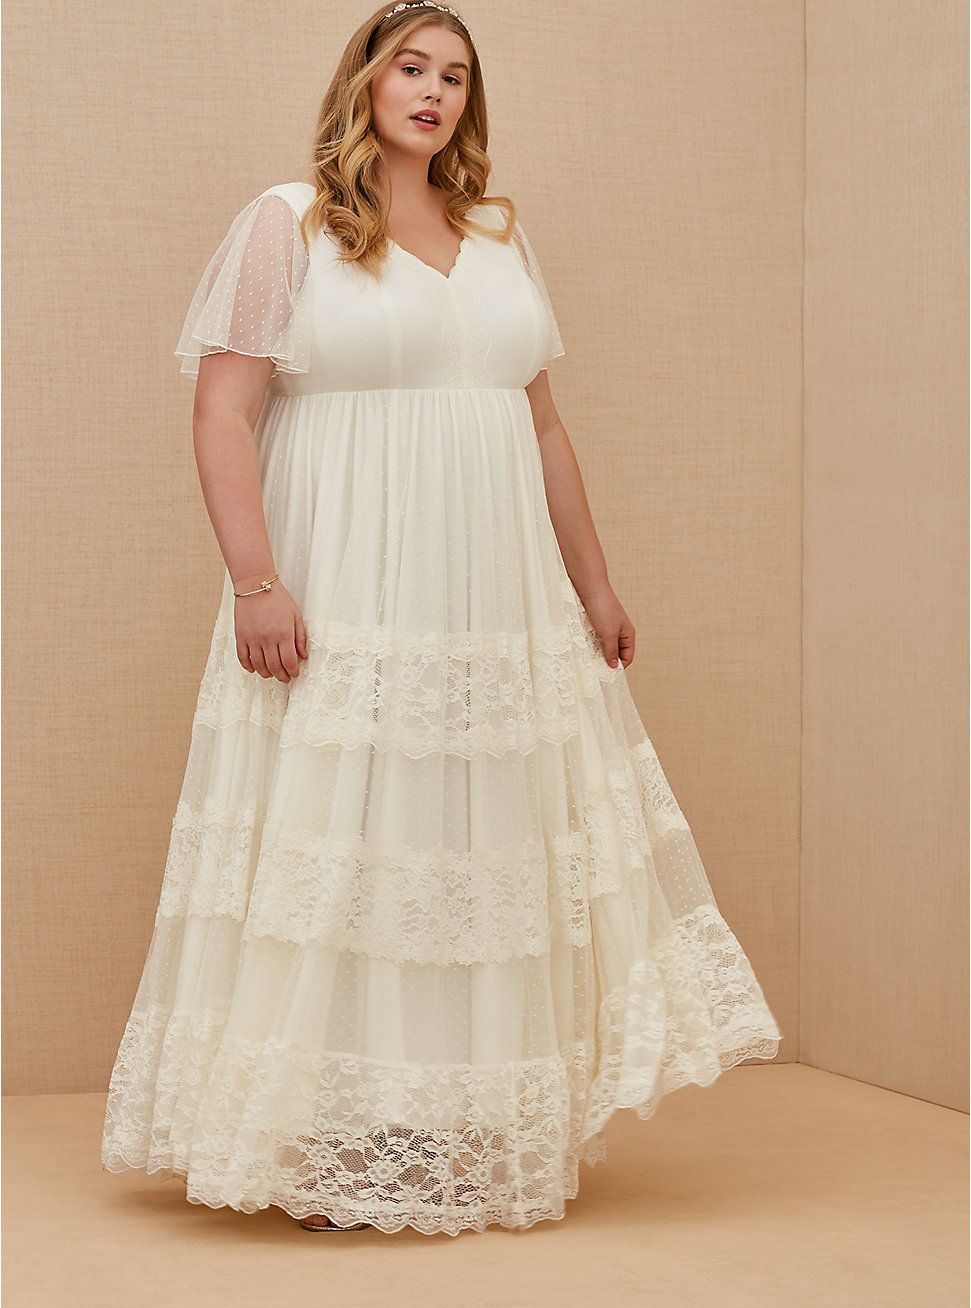 Ivory Lace A Line Boho Wedding Dress Simple Wedding Dress Casual Plus Size Wedding Gowns Casual Wedding Dress [ 1308 x 971 Pixel ]